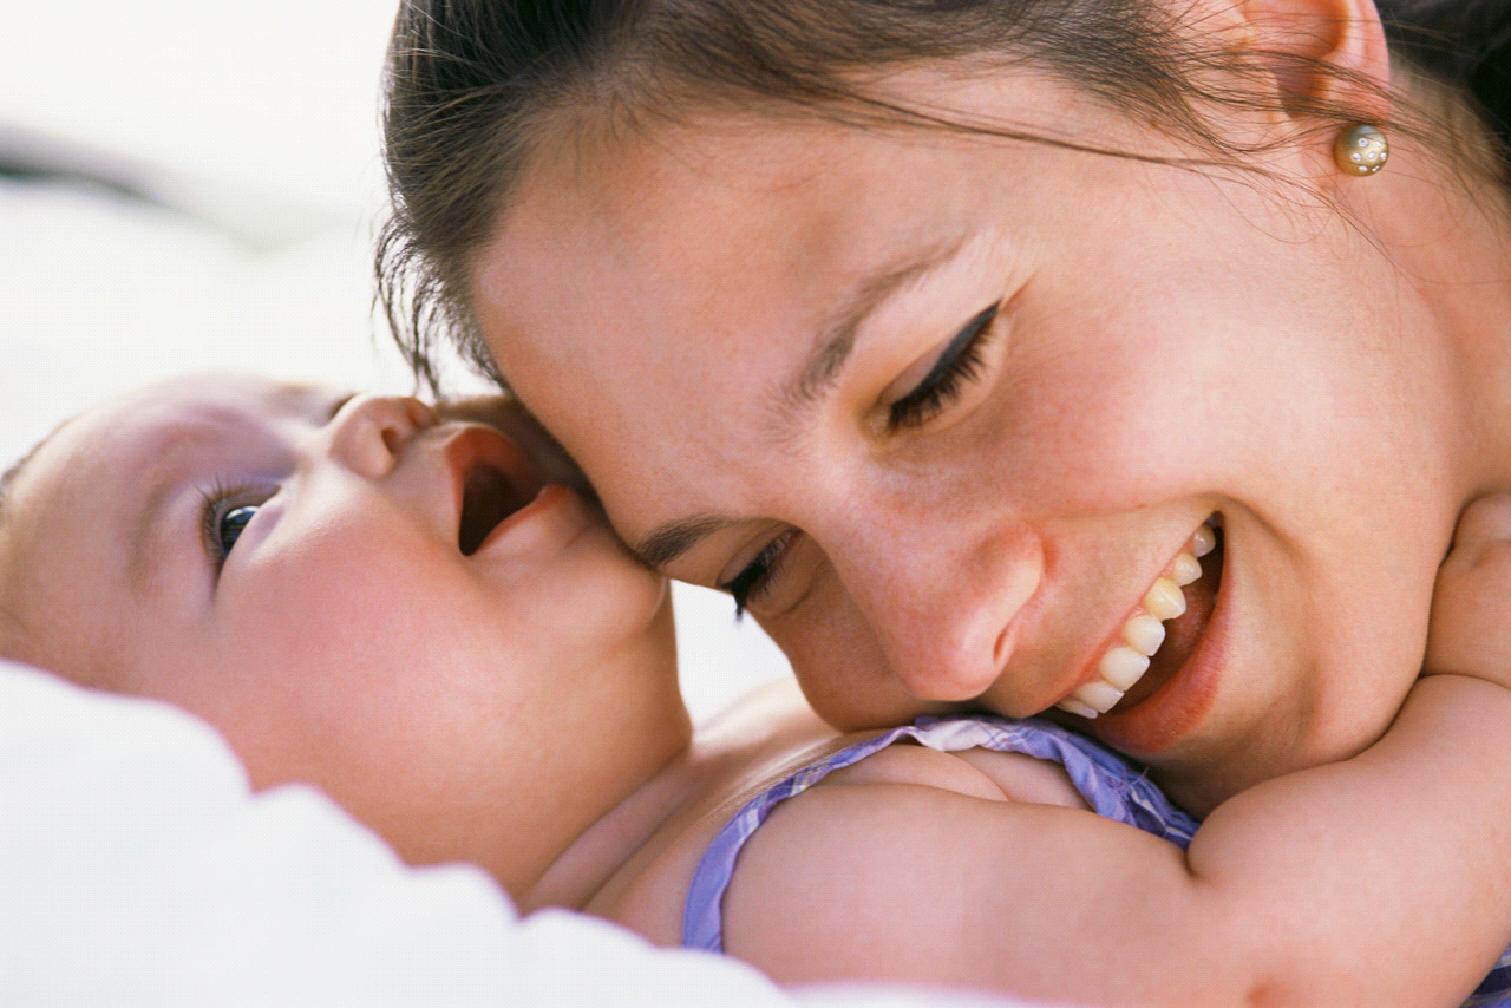 http://3.bp.blogspot.com/-ZOGTbLdMzFY/T6s_kcib-vI/AAAAAAAAAa4/MECmd4R9DHU/s1600/mom-baby.jpg